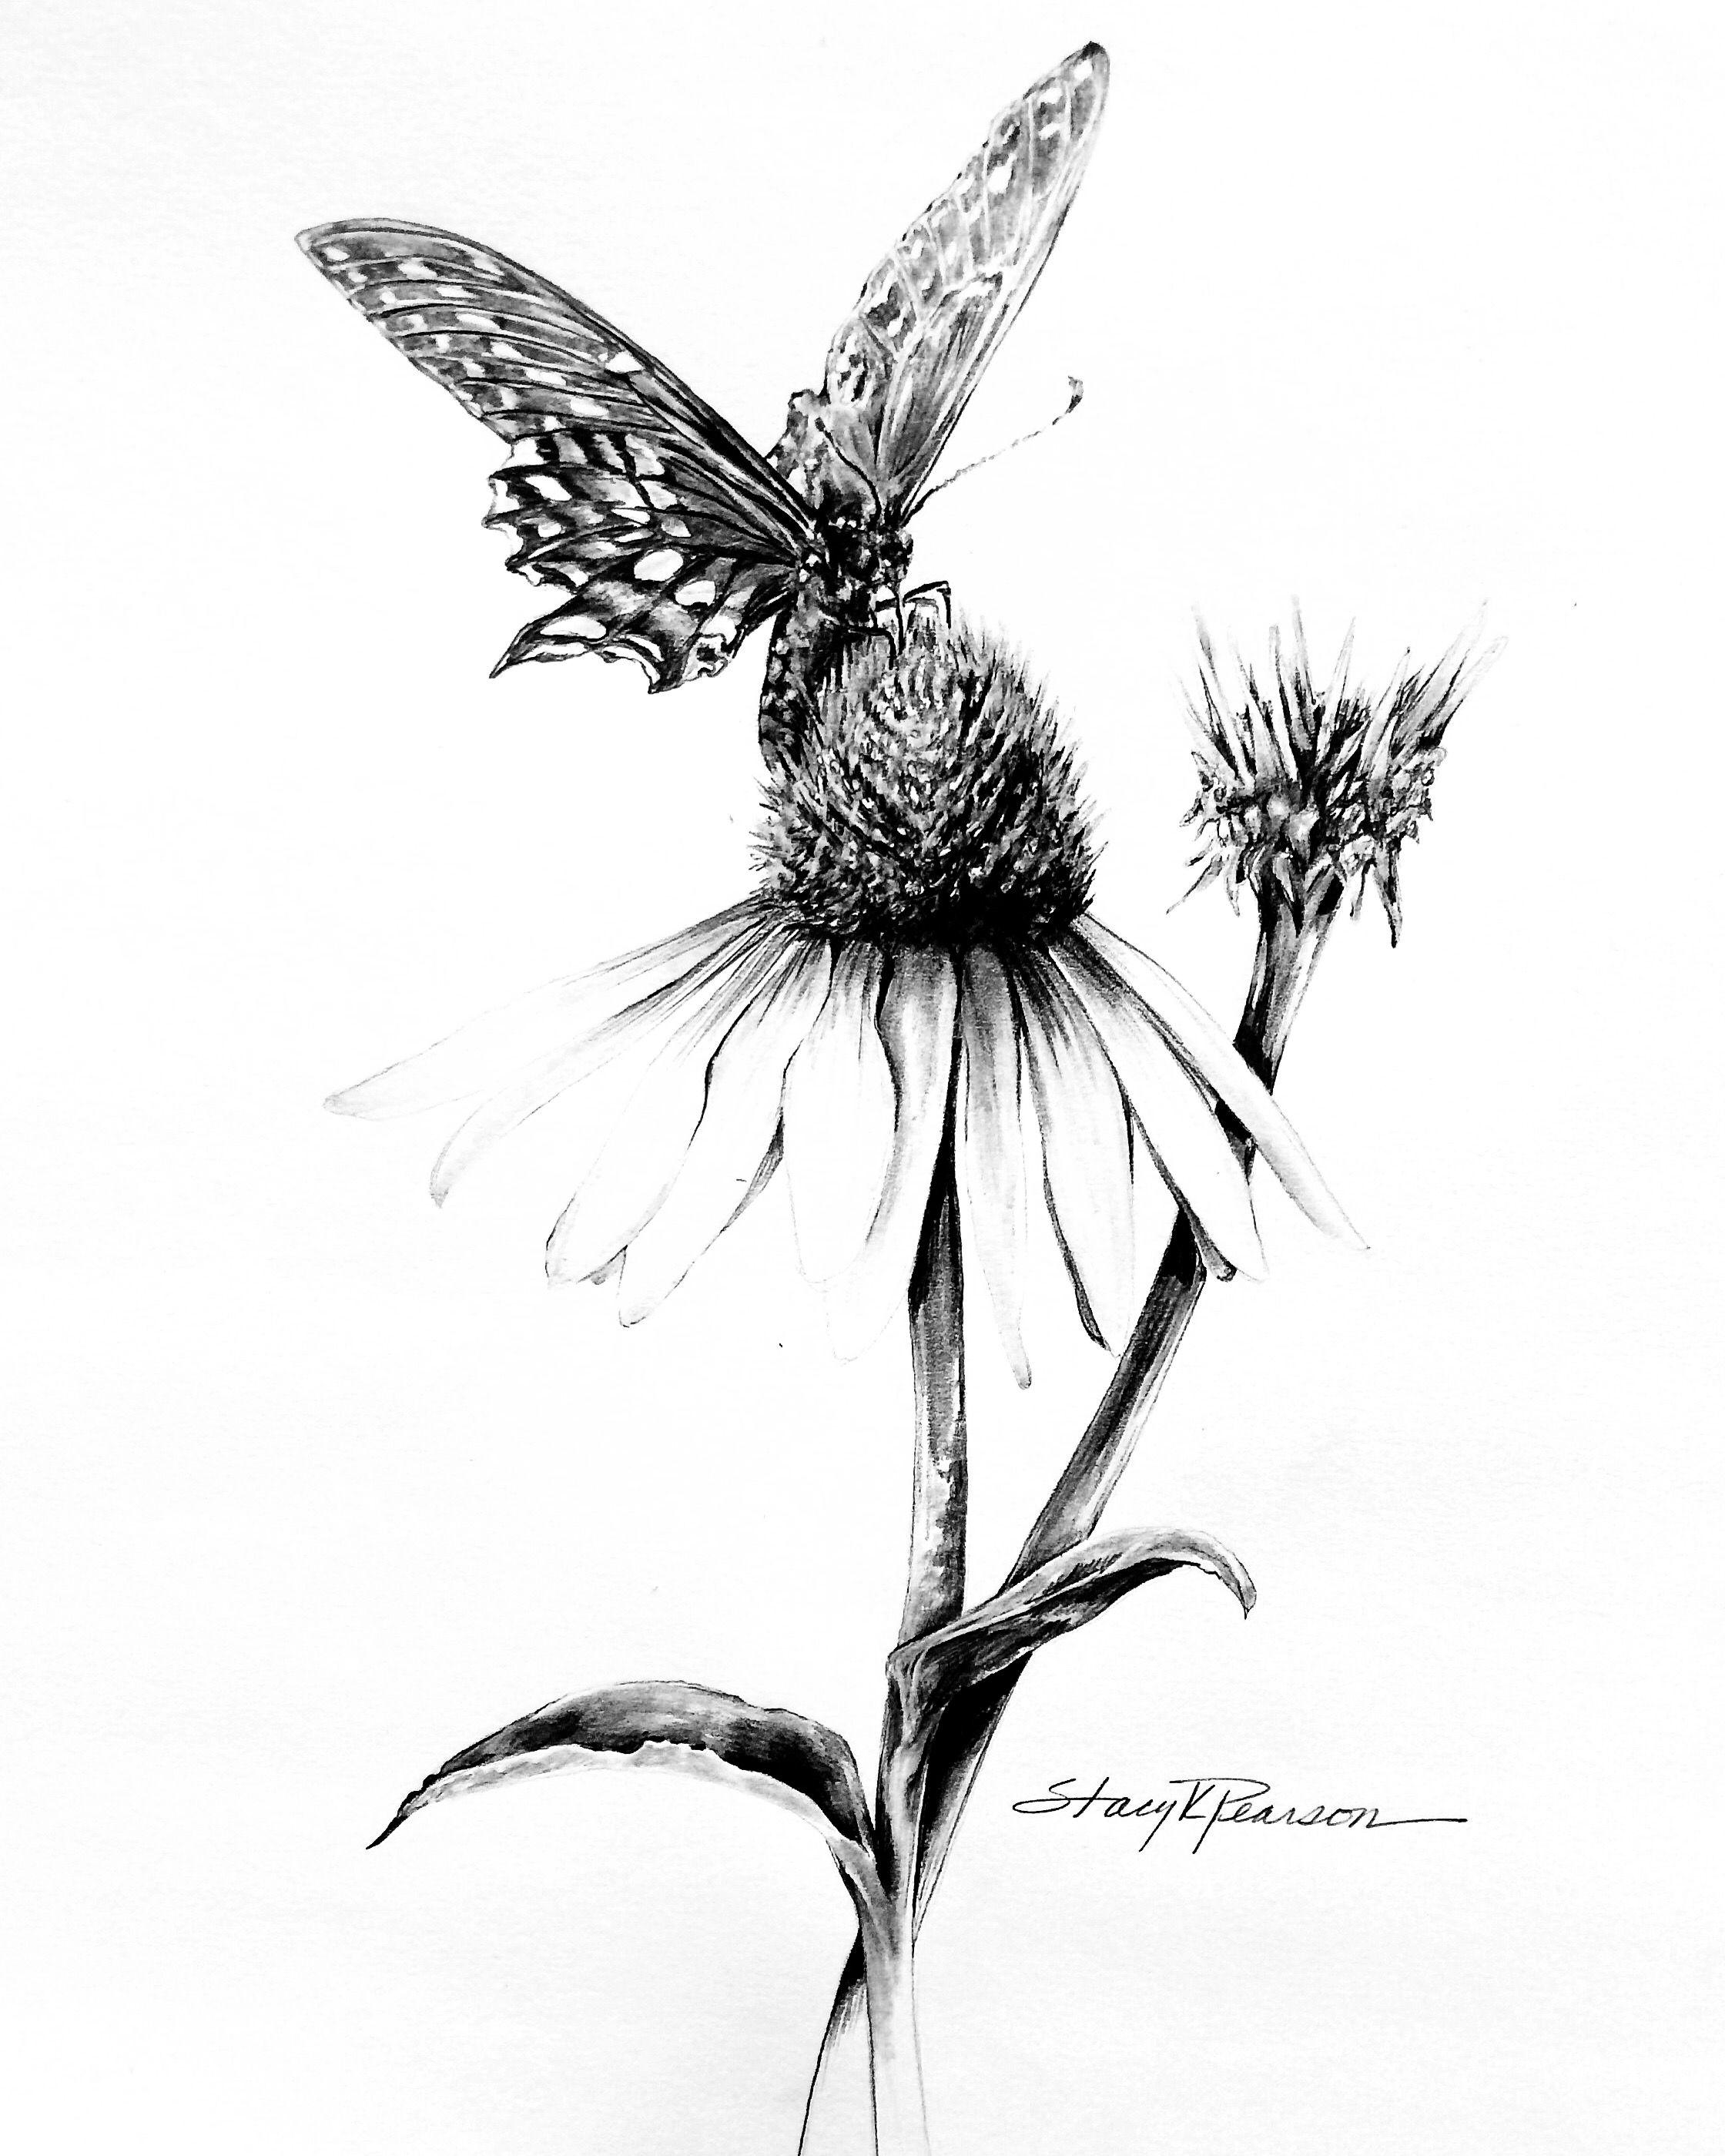 Skpearson Art Coneflower And Friend Butterfly Pencil Drawing Pencil Drawings Art Drawings